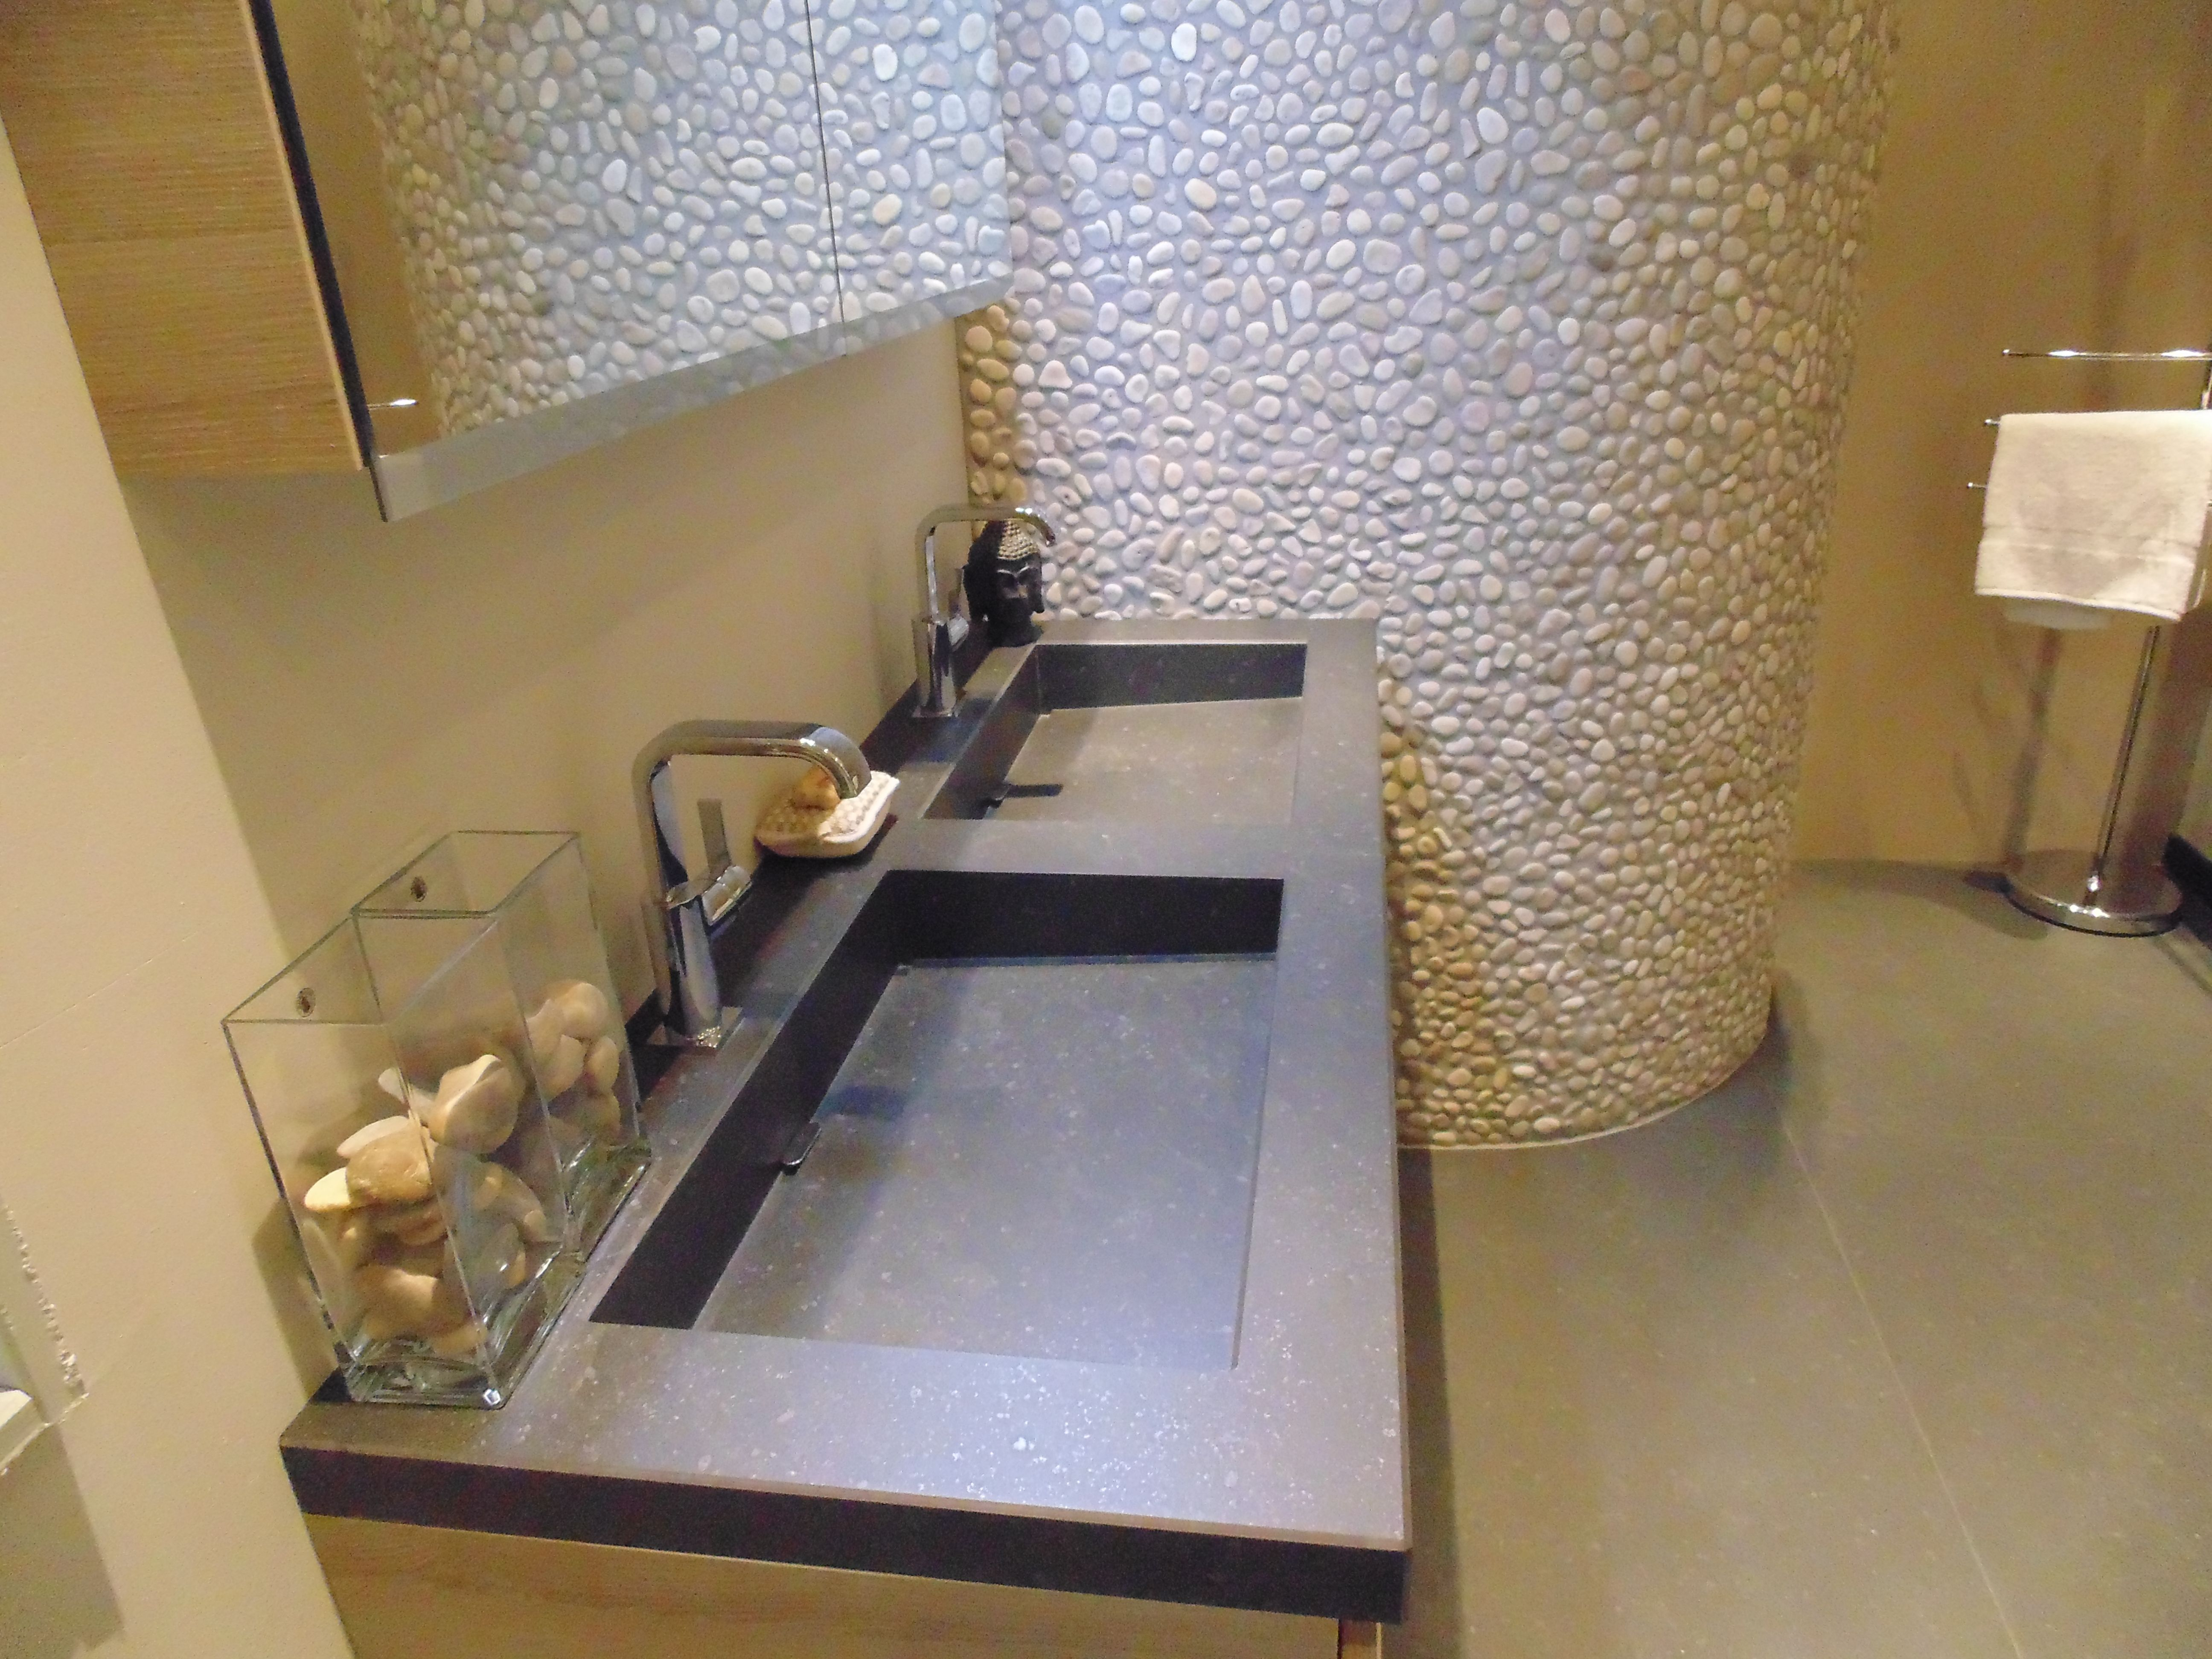 Inloopdouche Met Wastafelkast : Wastafelmeubel showroom showroom wouters tegels en sanitair